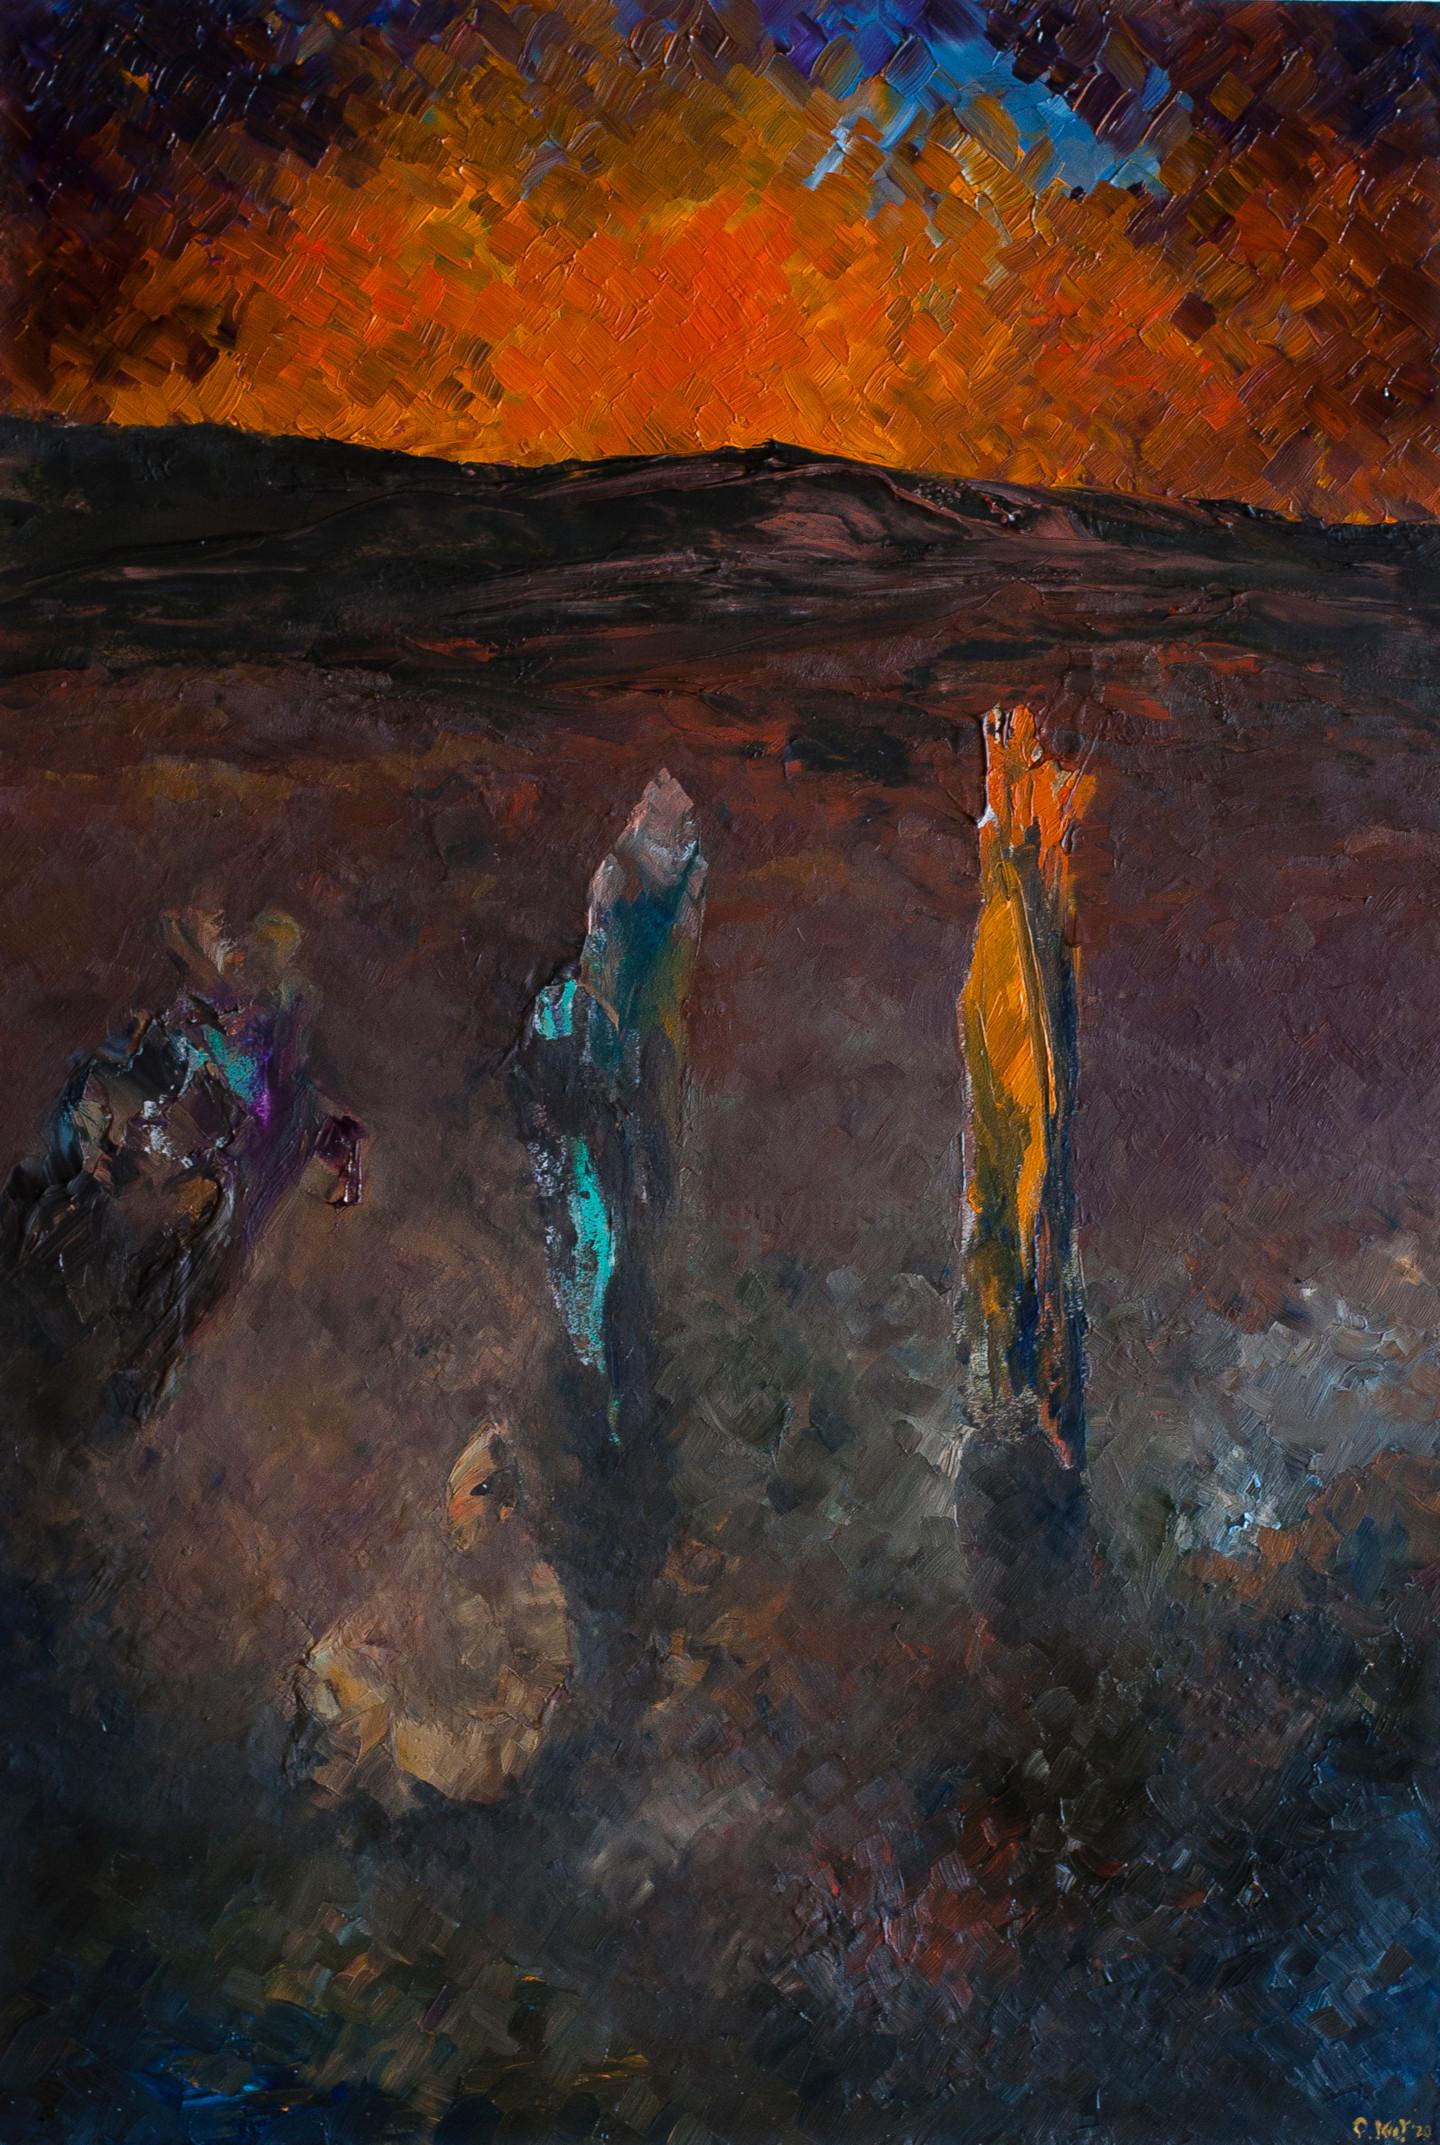 Przemek Kret - Poems of Exile